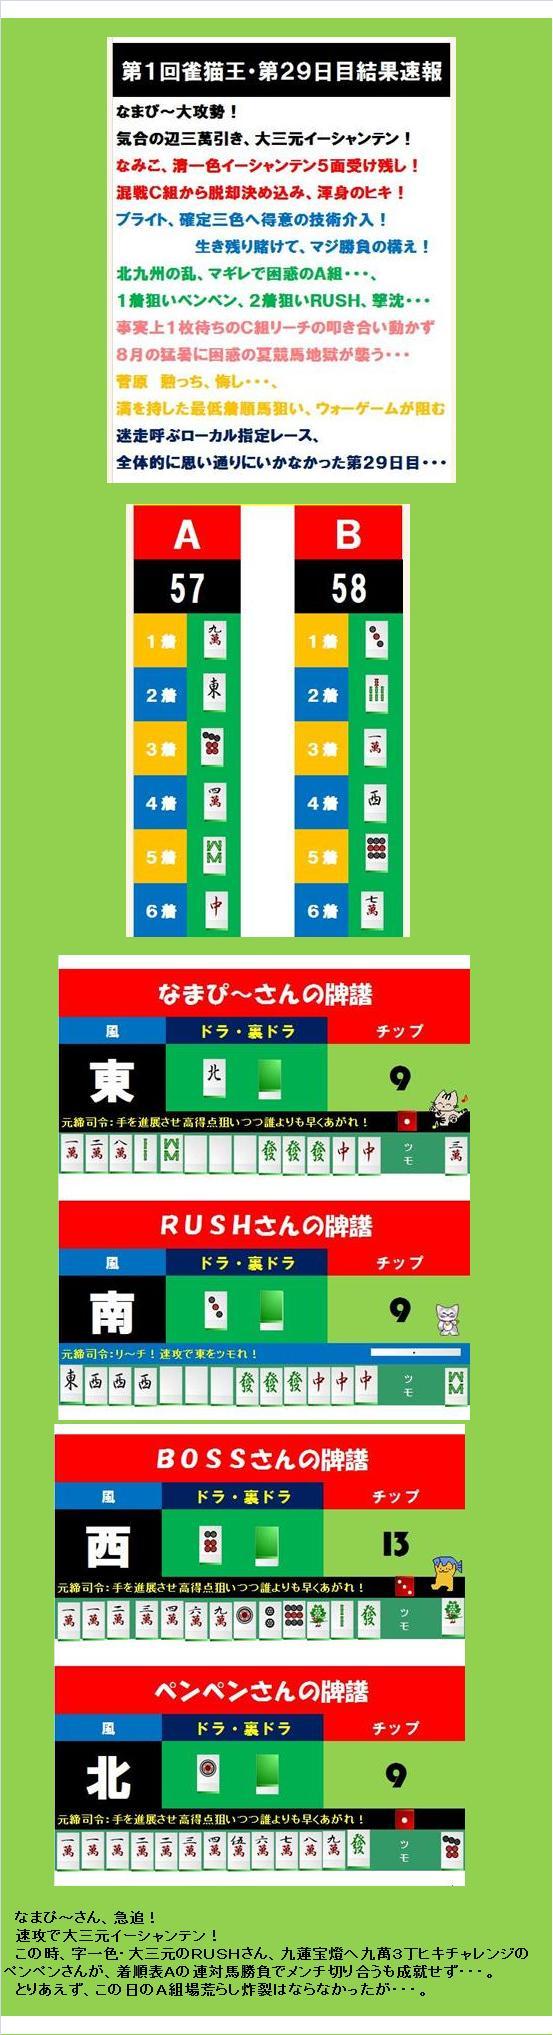 20100226・A組回顧14.jpg